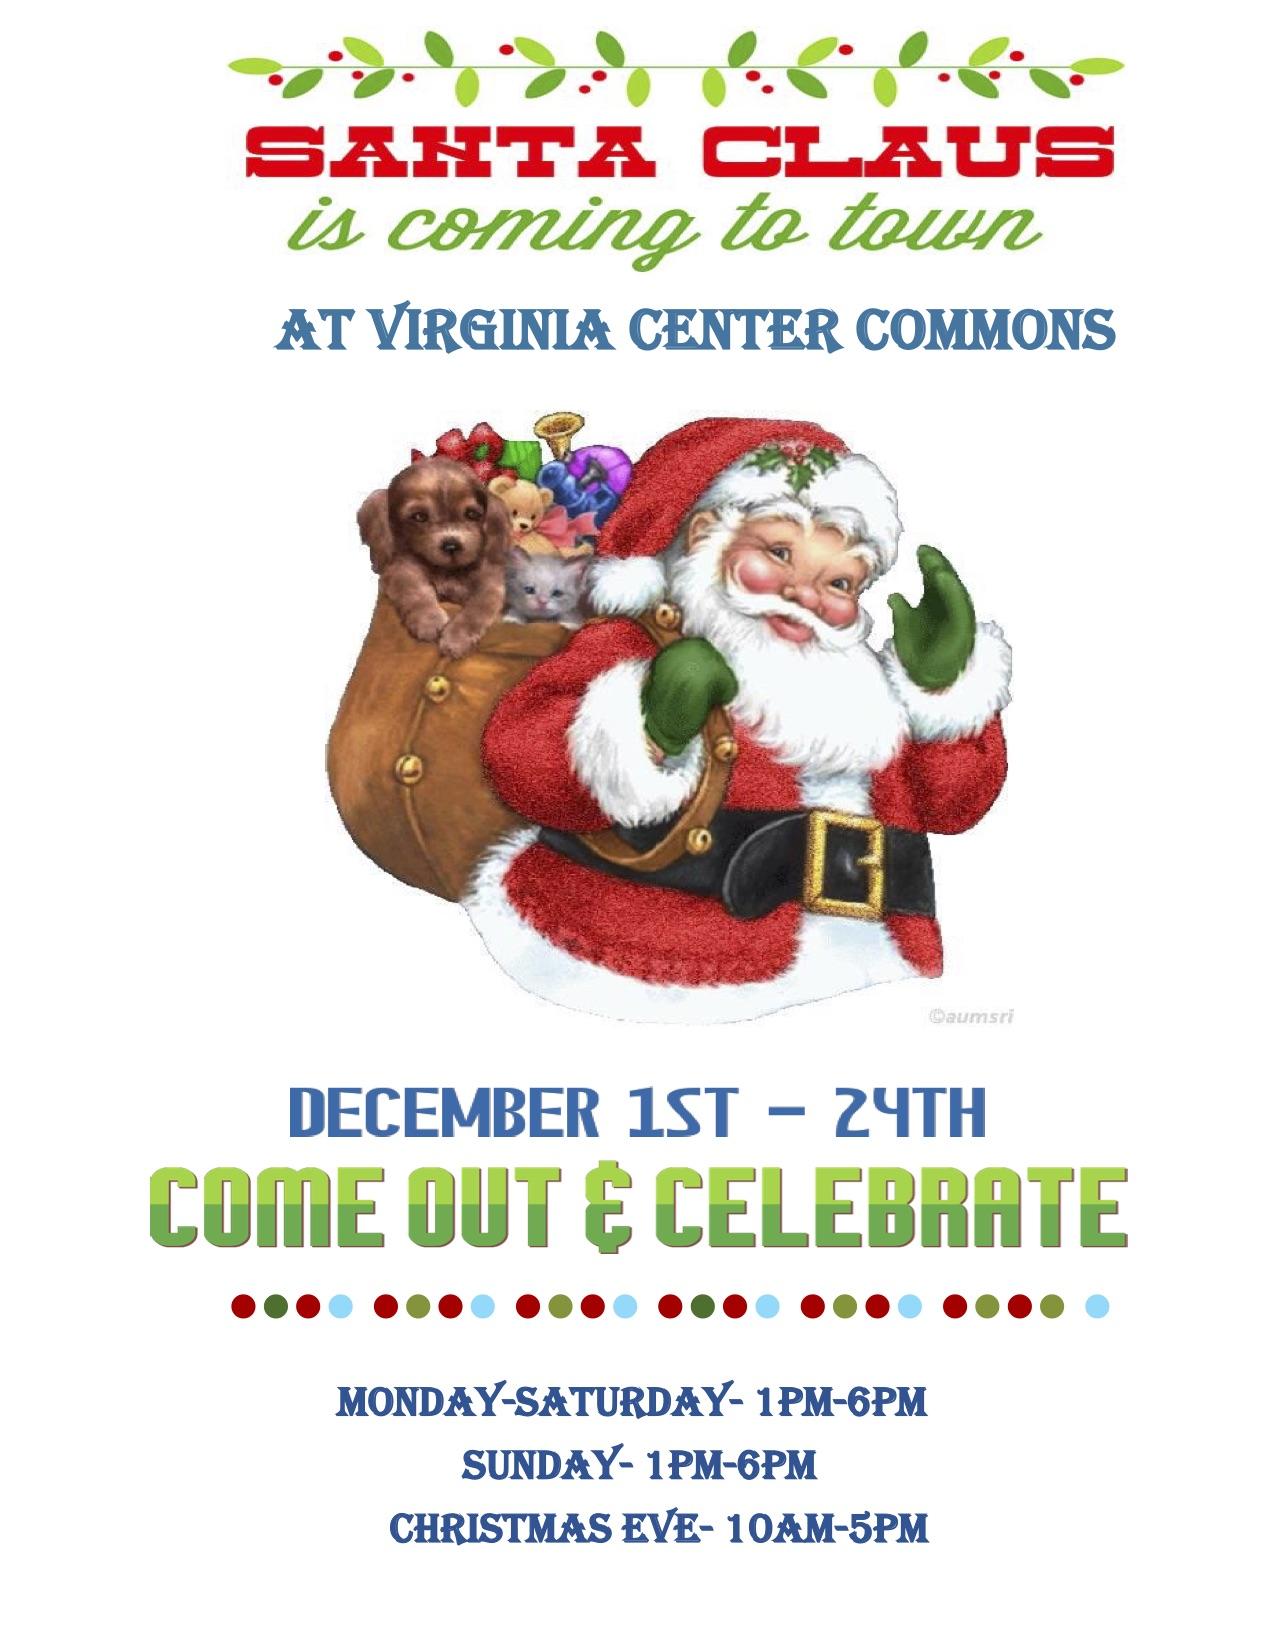 Santa hours for Virginia Center Commons